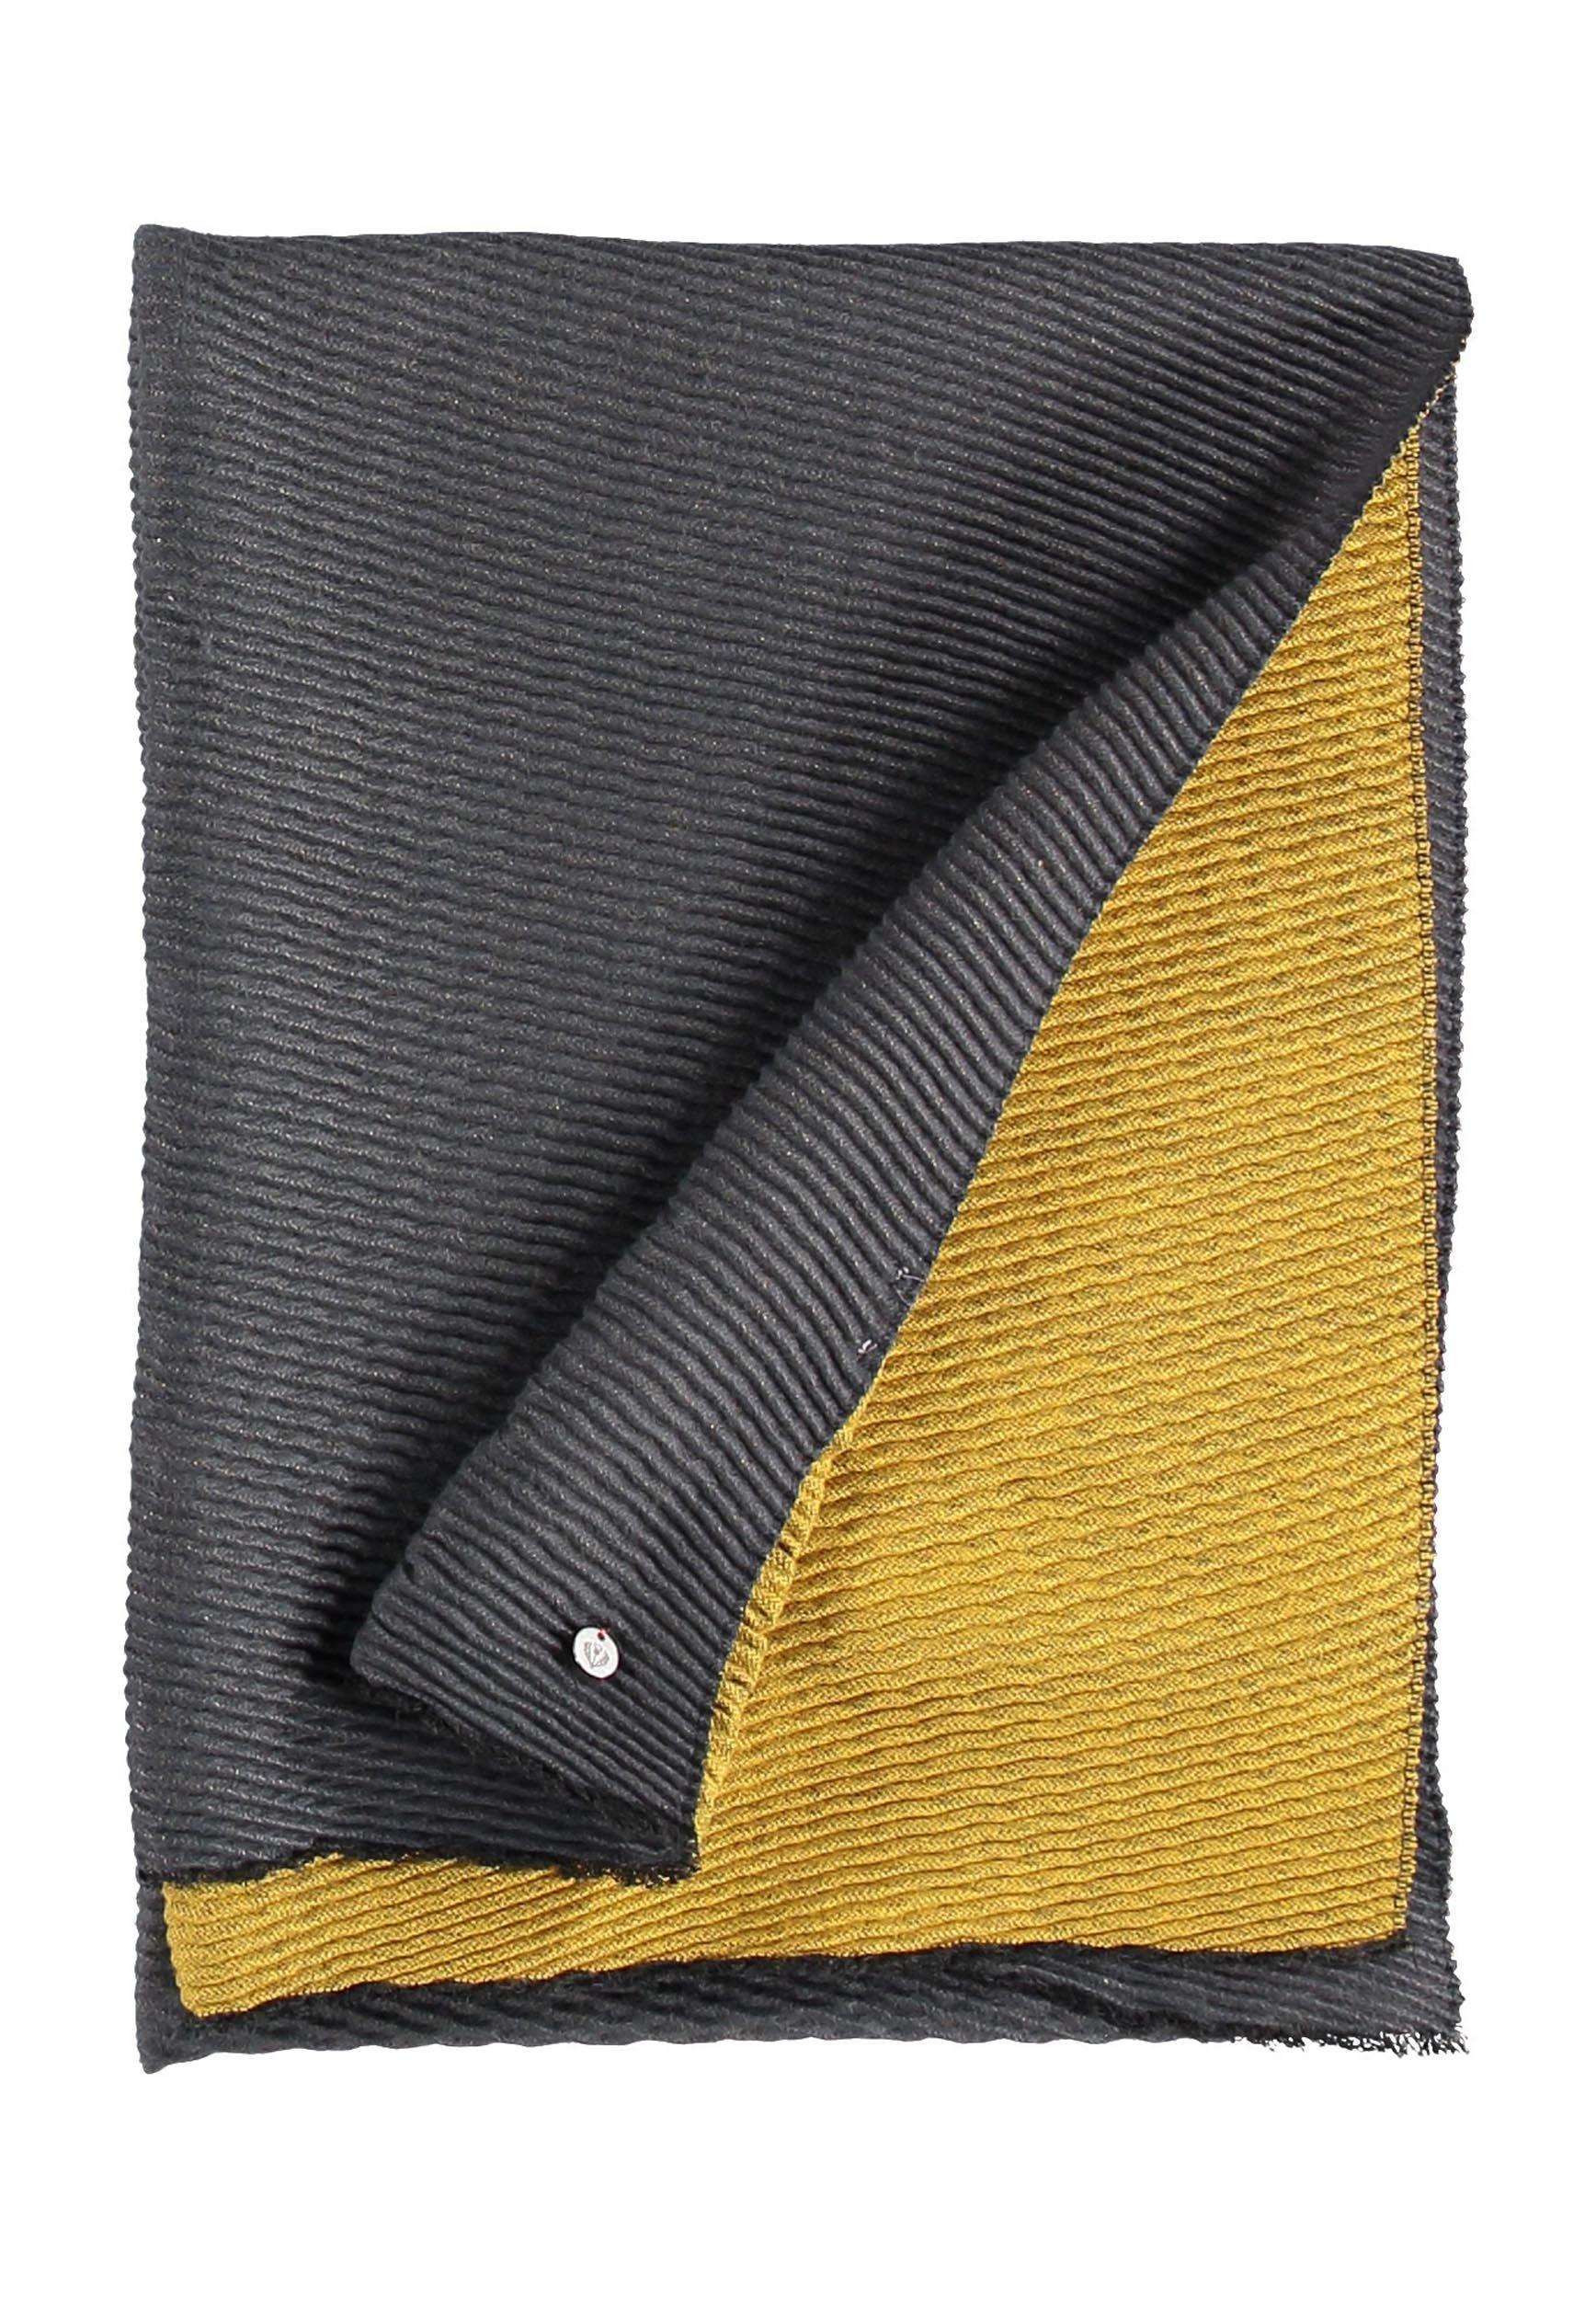 Fraas Schal - Grey/yellow/grau